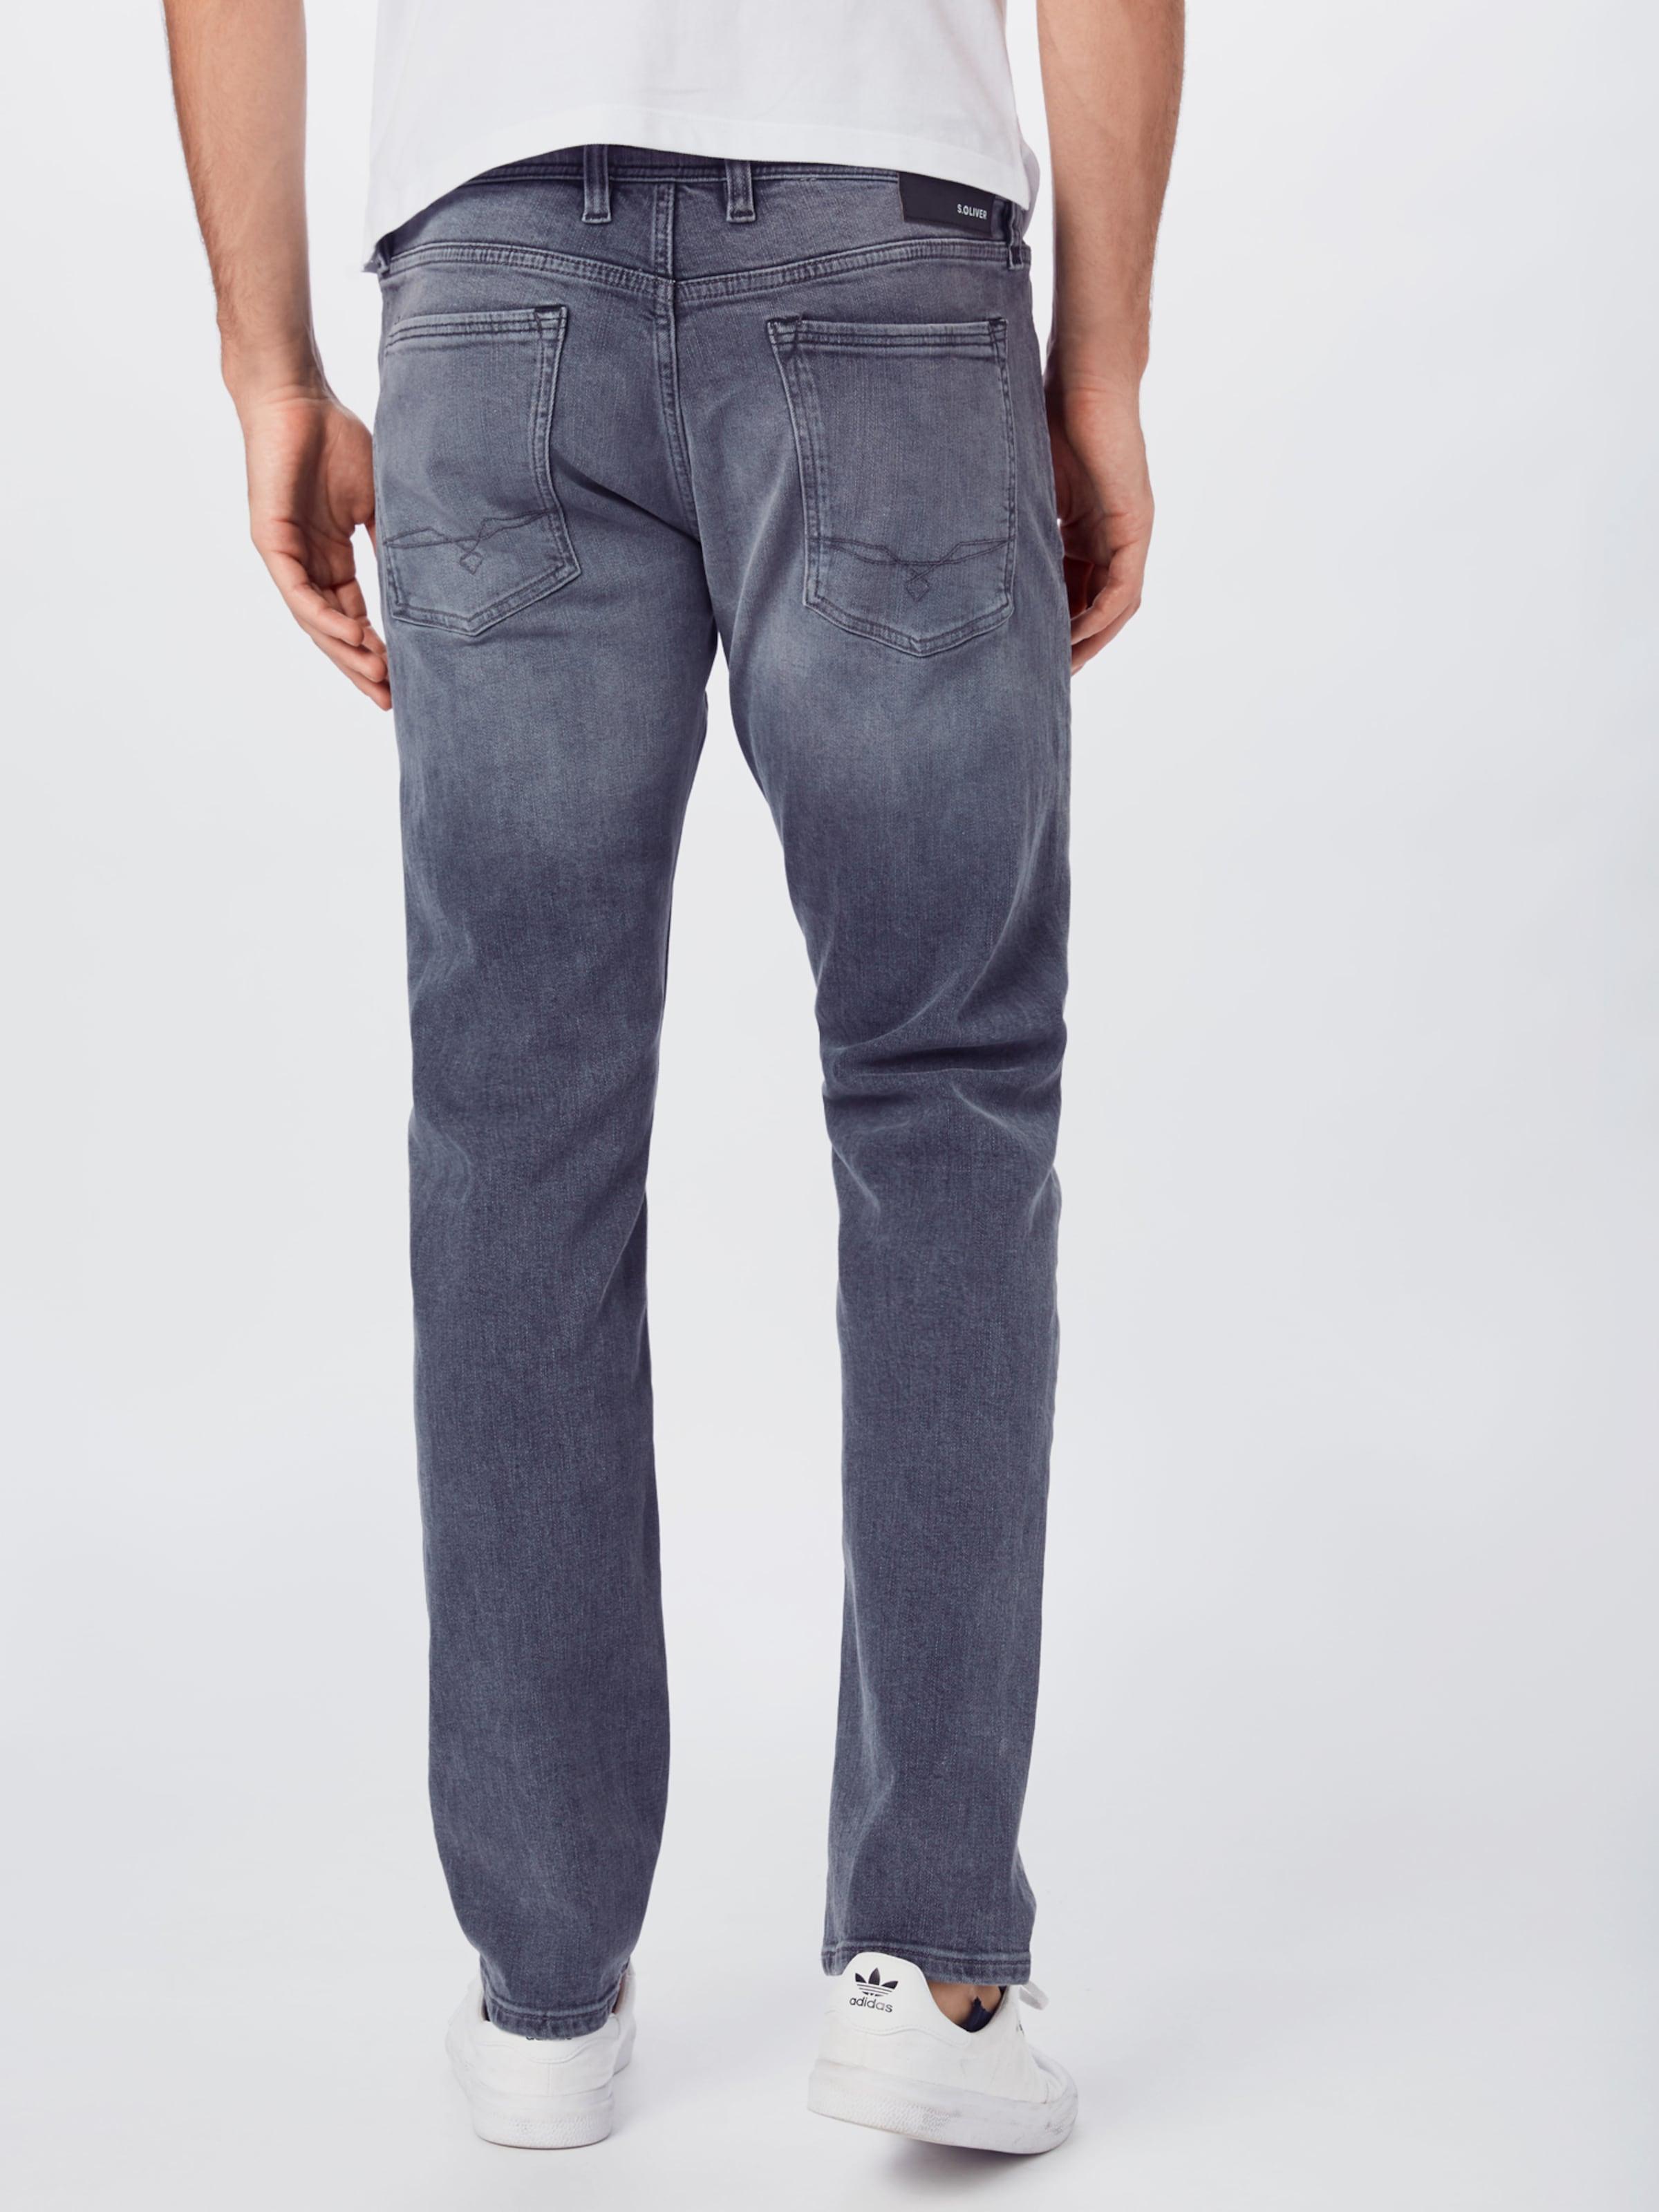 s.Oliver Jeans i grå denim